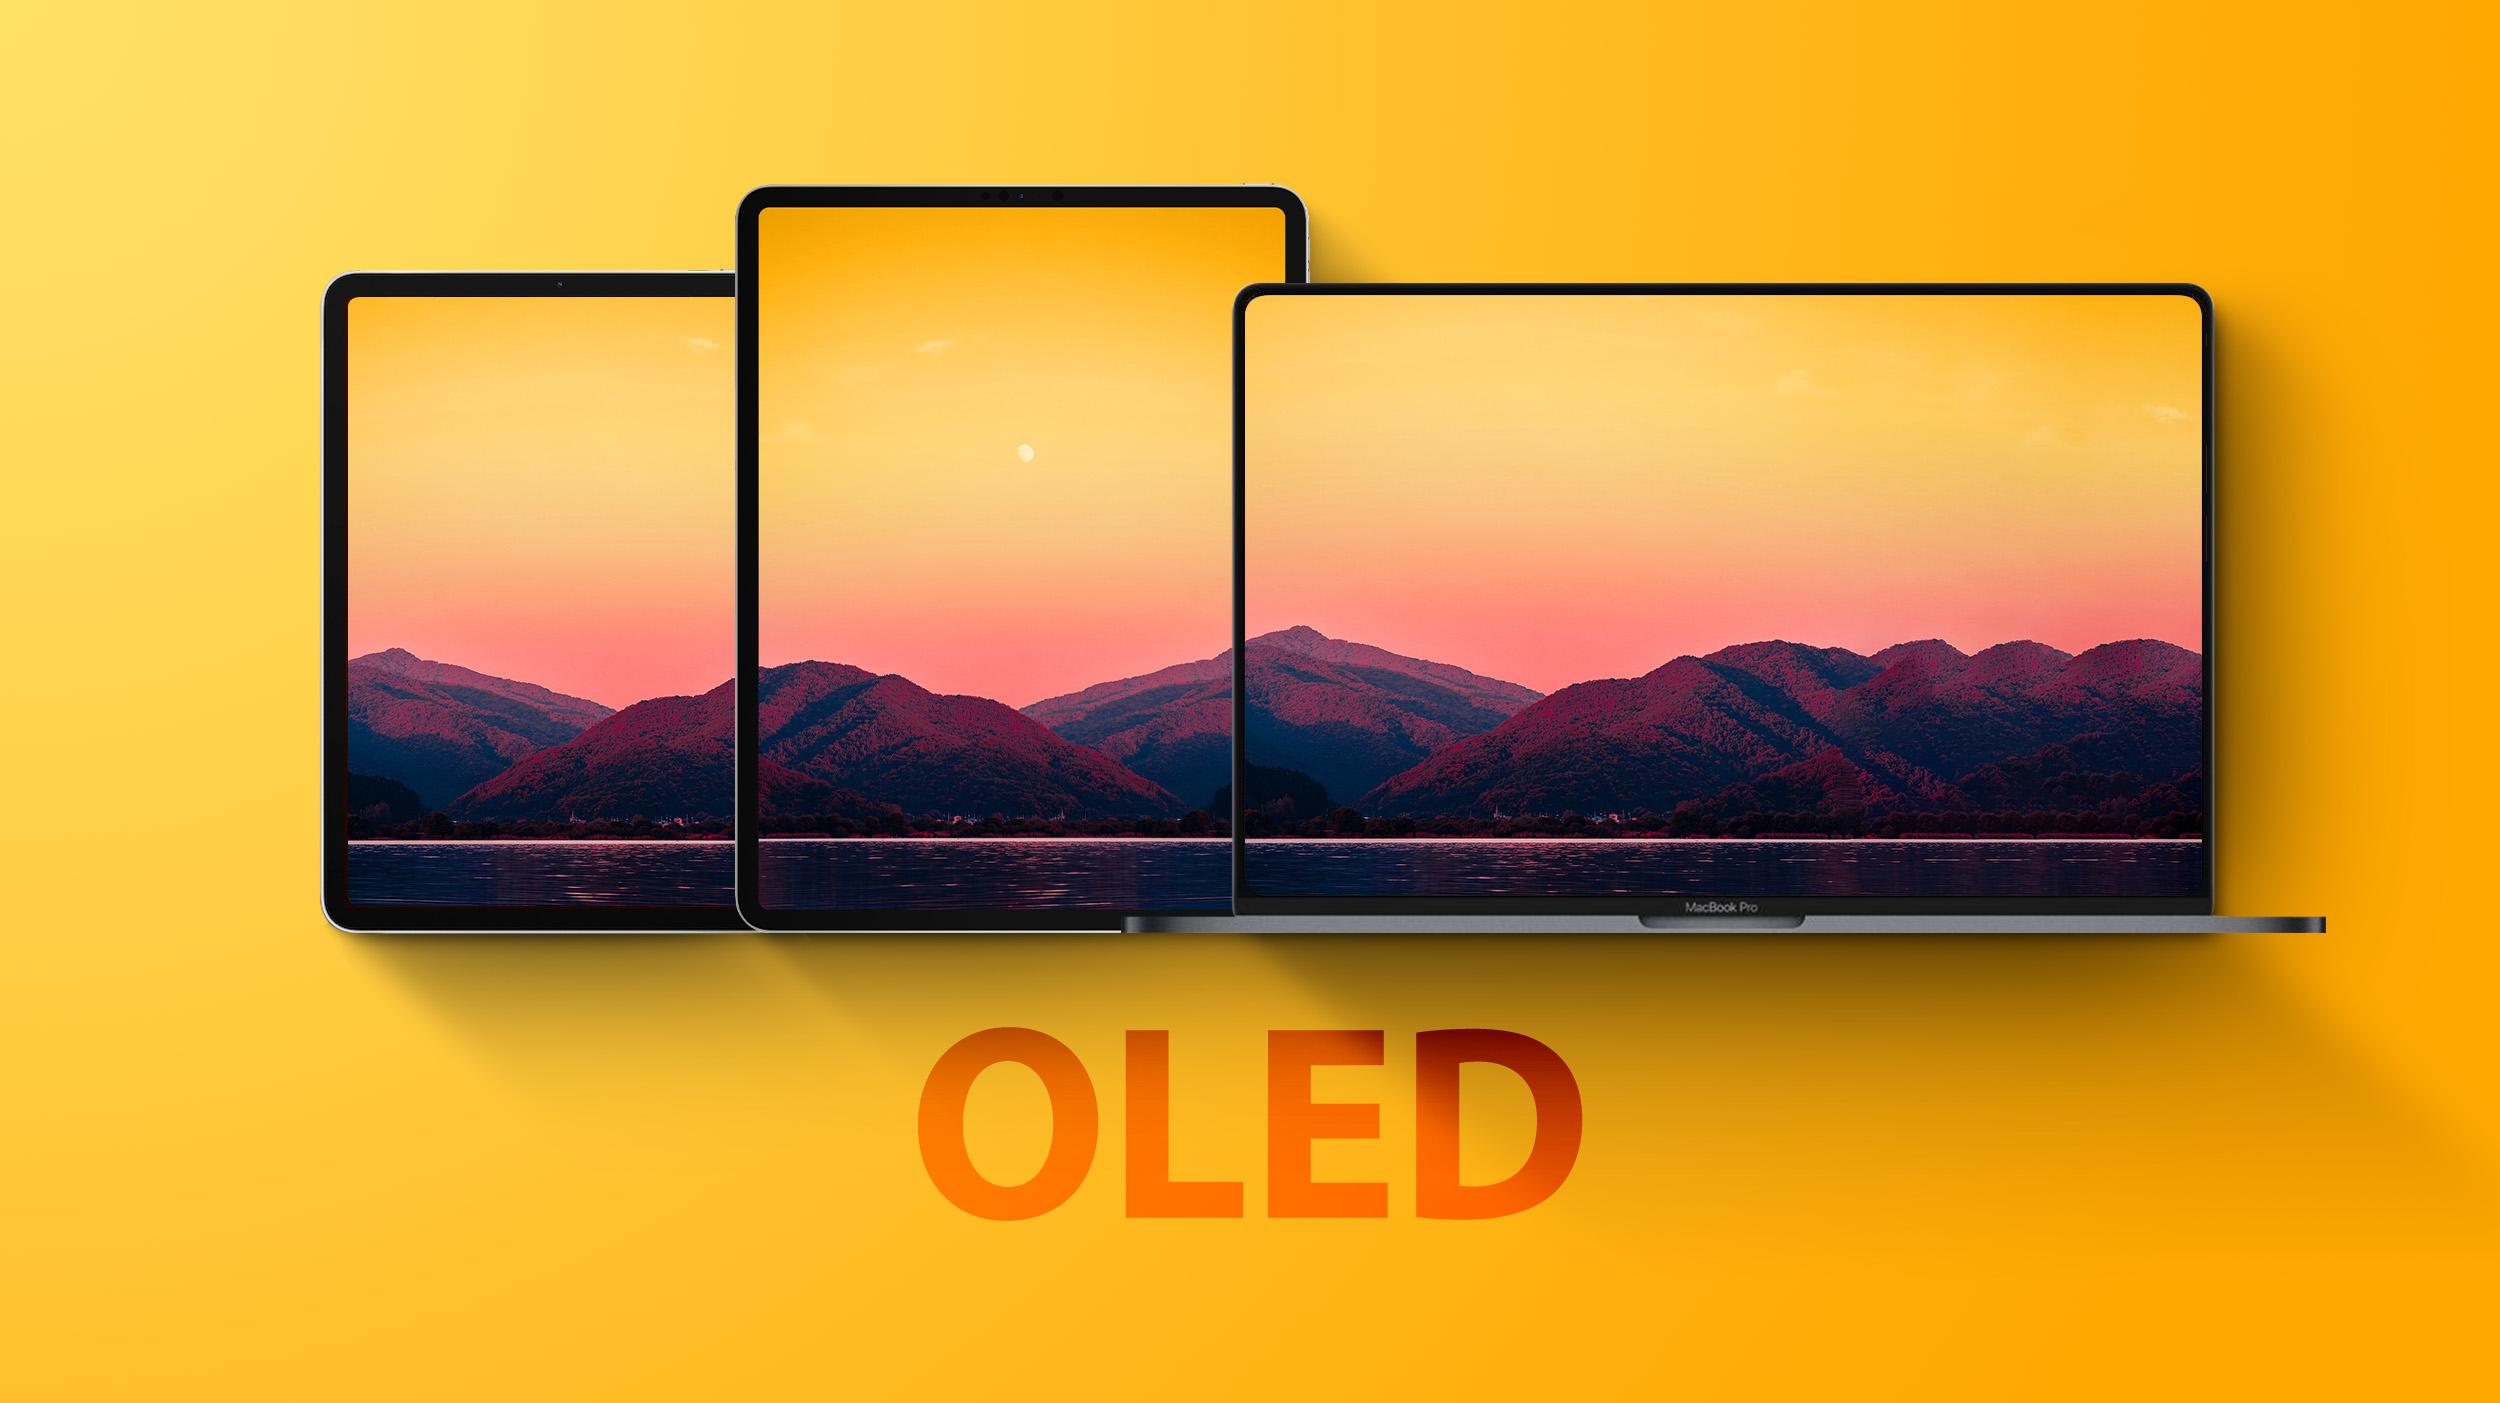 Oled iPads and MackBook Pro